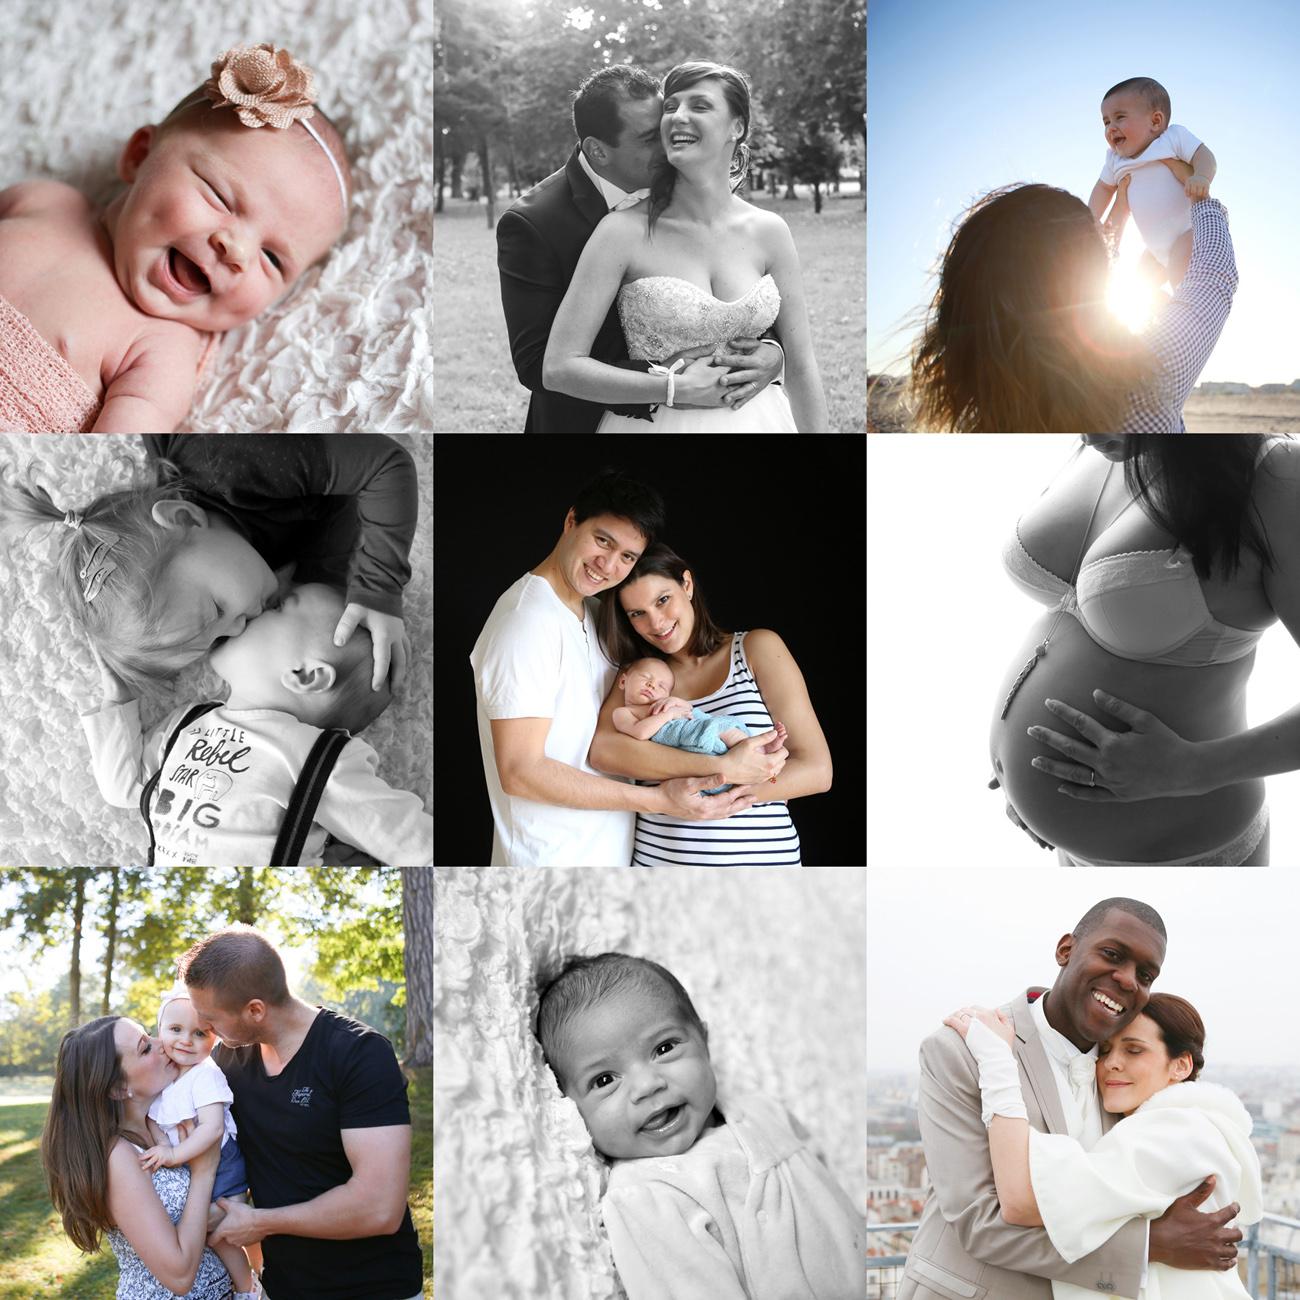 photographe-mariage-famille-montpellier-34-saintgely